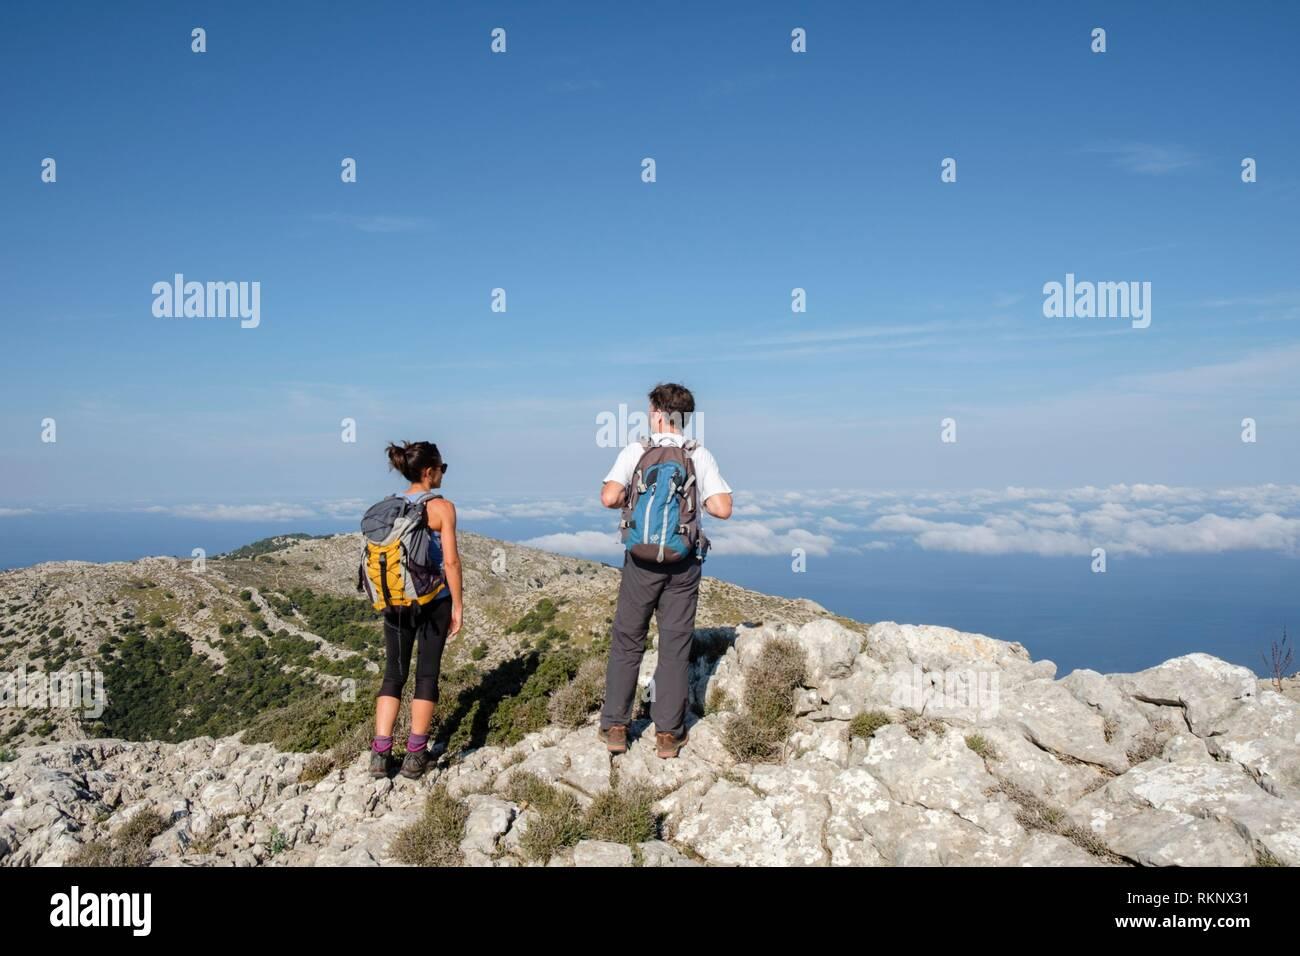 Hikers in Puig des Teix, Valldemossa, Mallorca, Balearic islands, Spain. - Stock Image